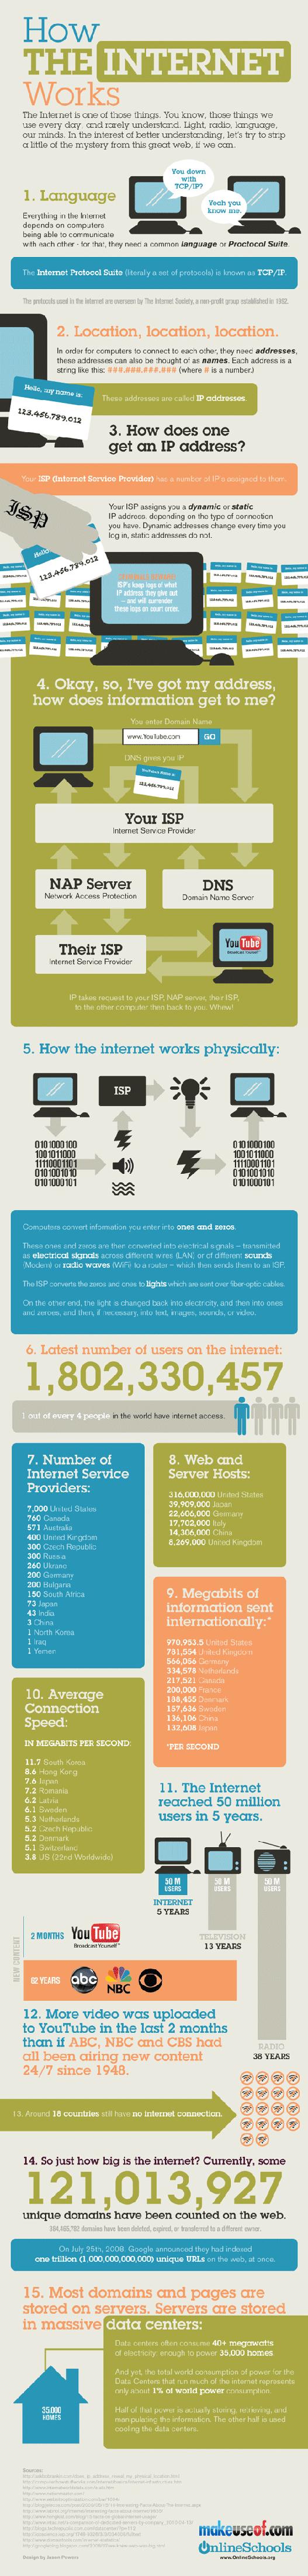 internet infographic smaller